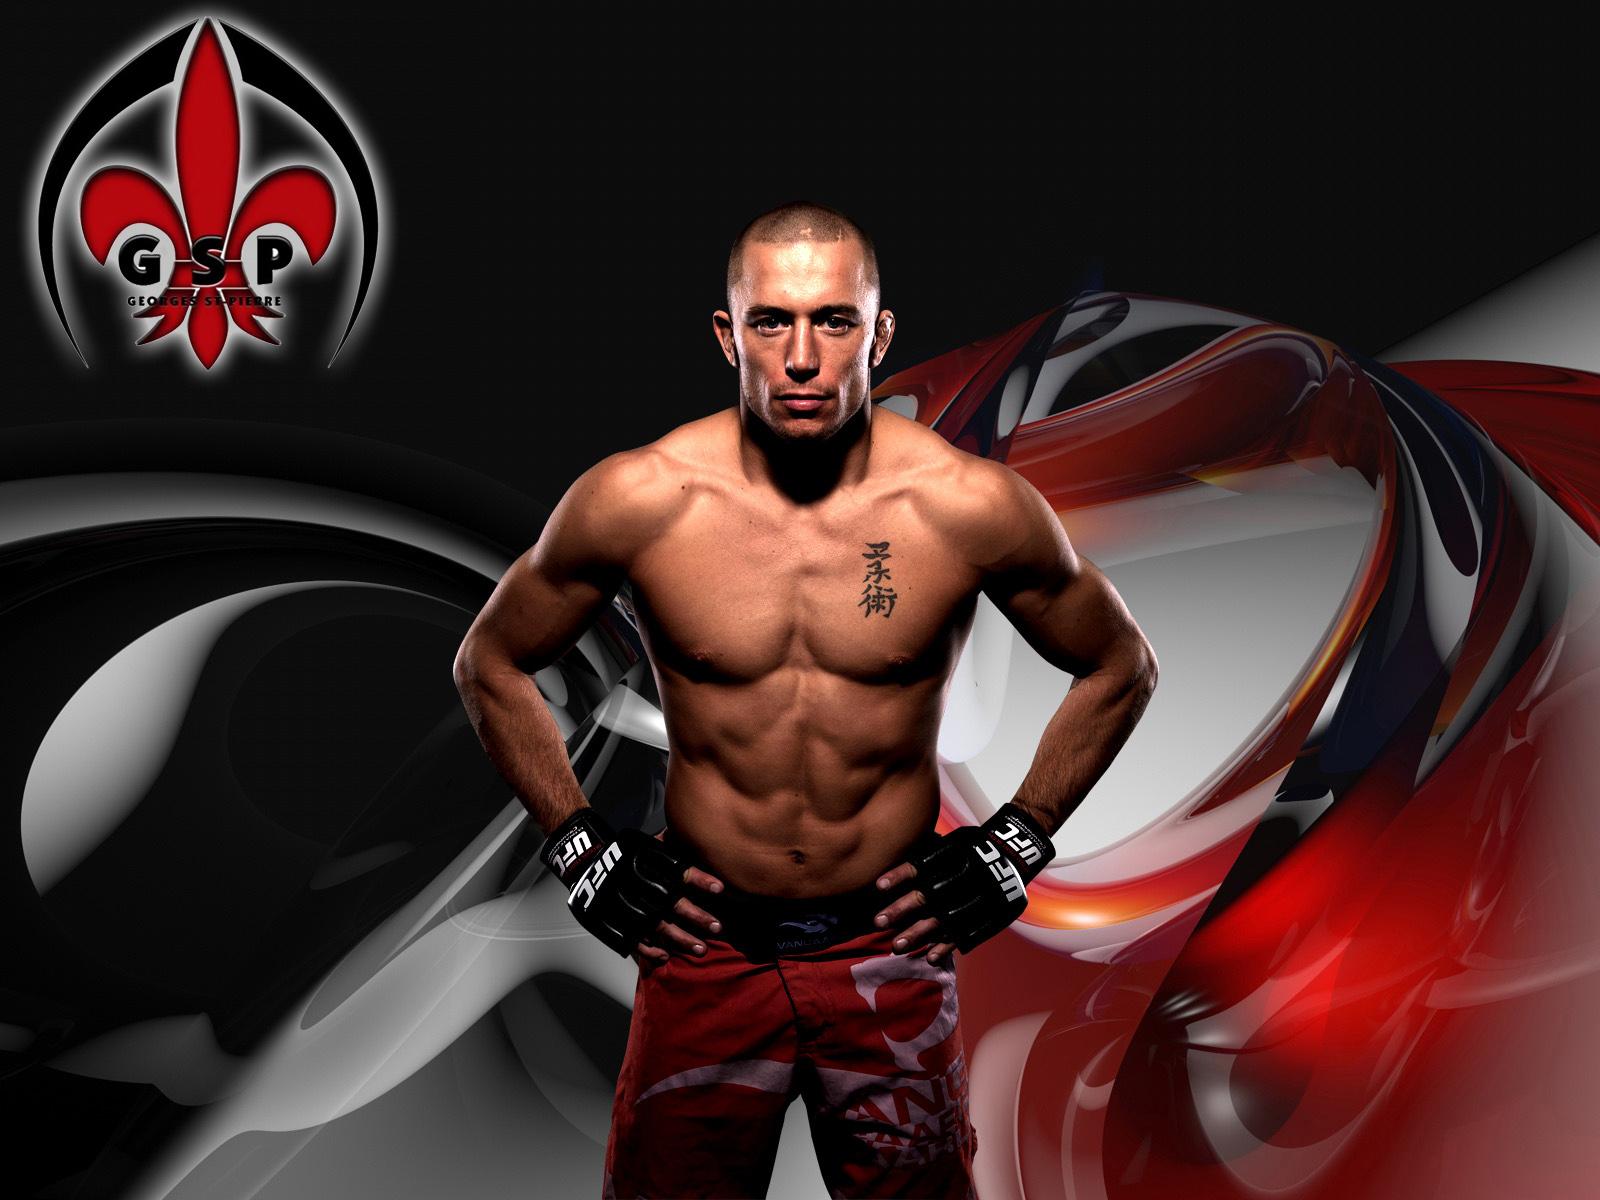 UFC Gallery UFC MMA Wallpaper Desktop Background Images 1600x1200